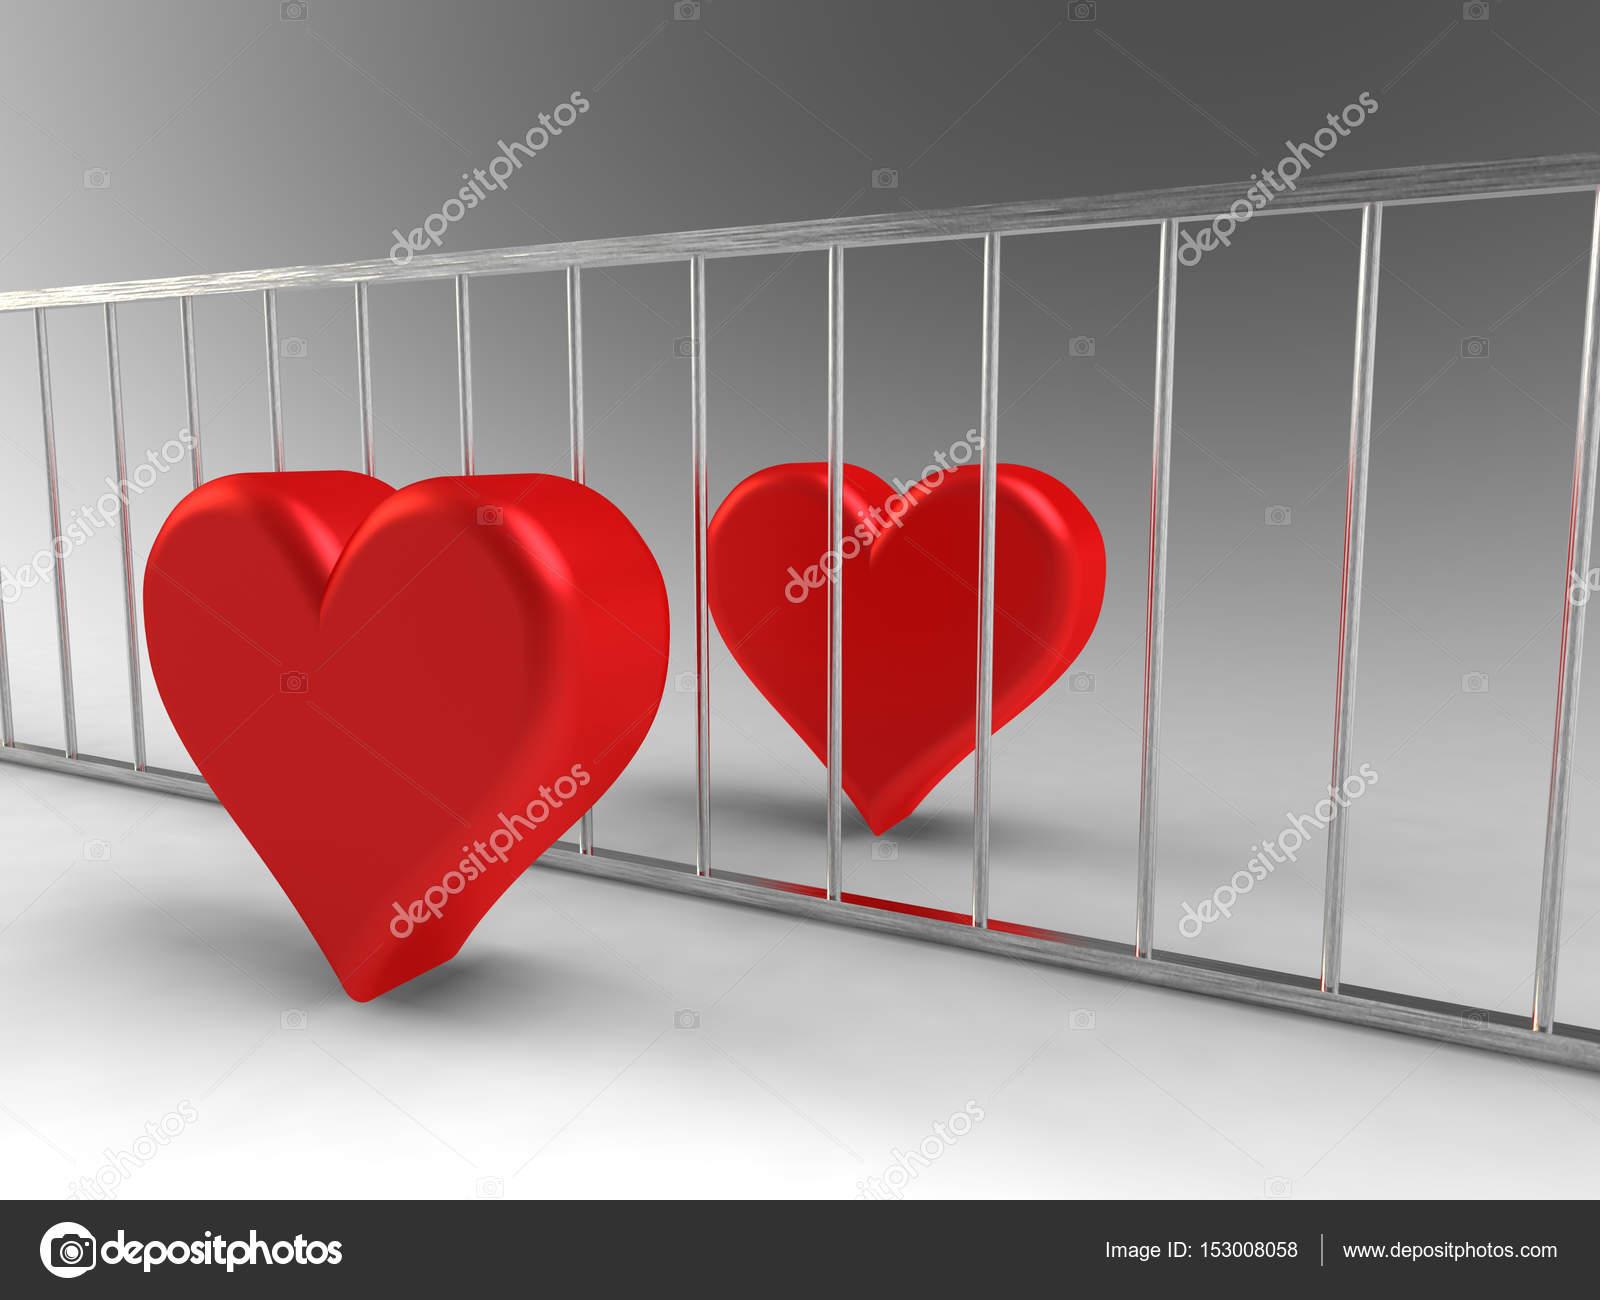 Forbidden love concept stock photo dandesign86 153008058 forbidden love concept stock photo 153008058 buycottarizona